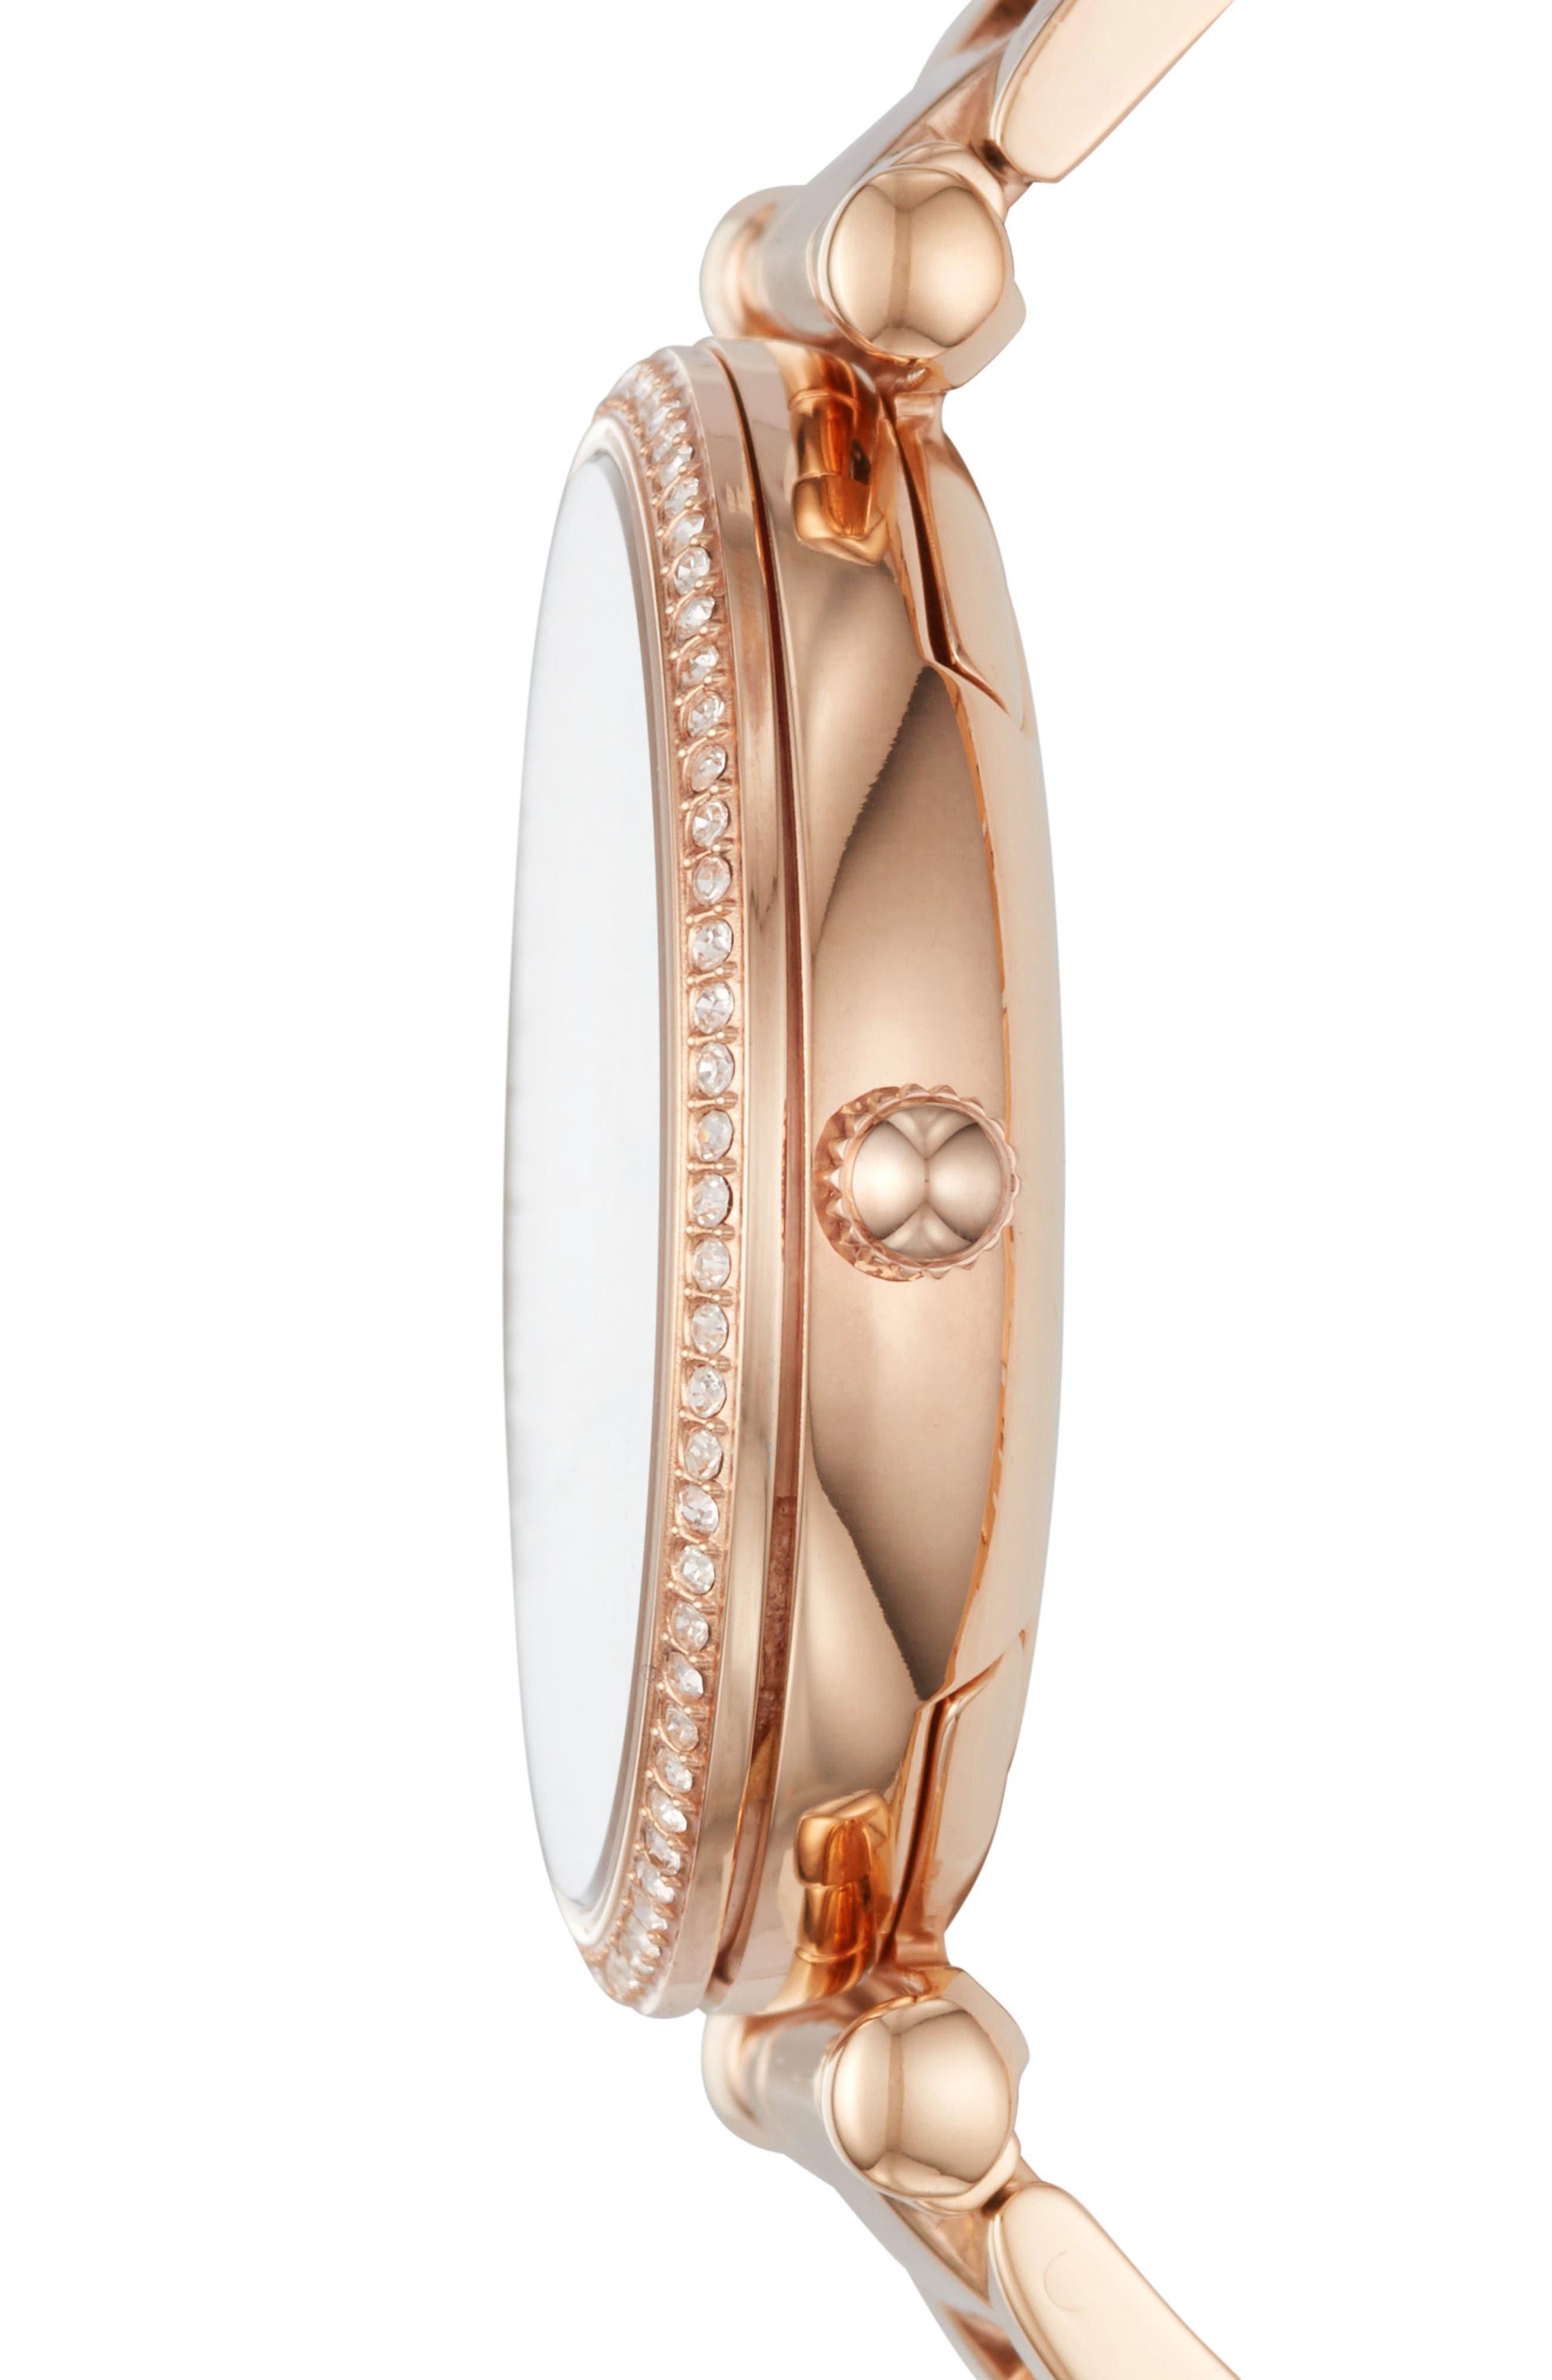 FOSSIL, Carlie T-Bar Crystal Bracelet Watch, 35mm, Alternate thumbnail 2, color, ROSE GOLD